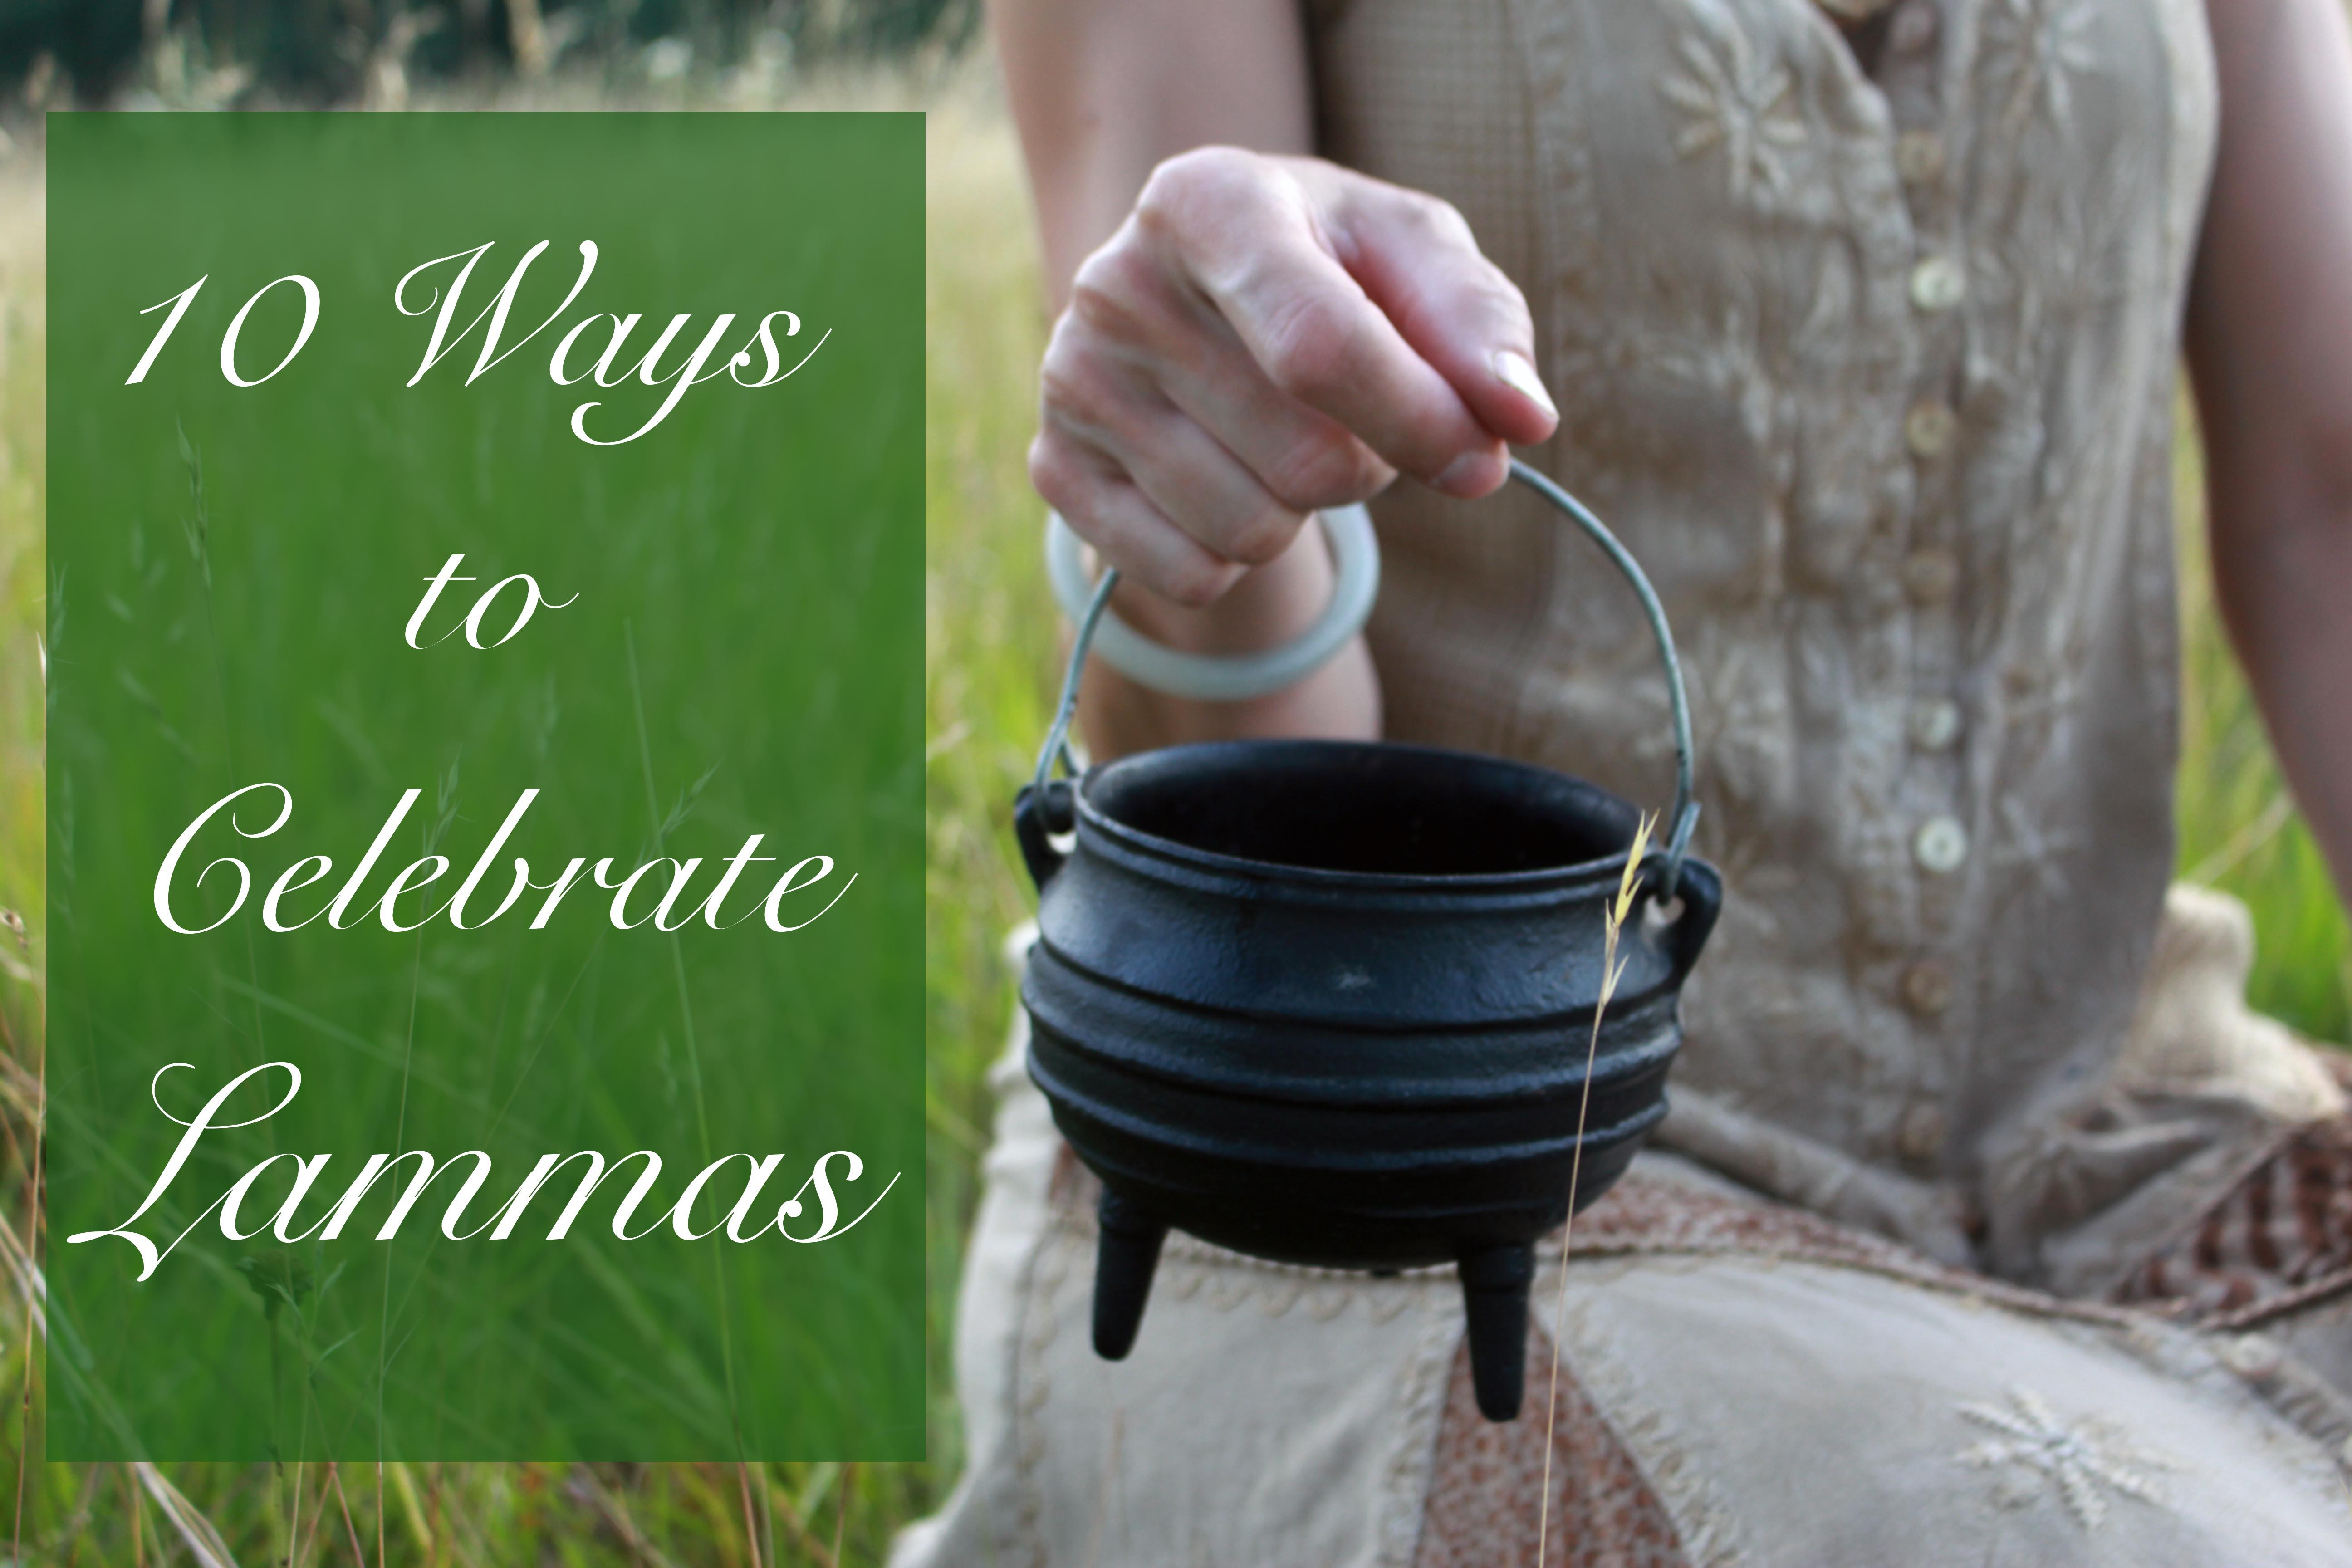 10 ways to celebrate lammas